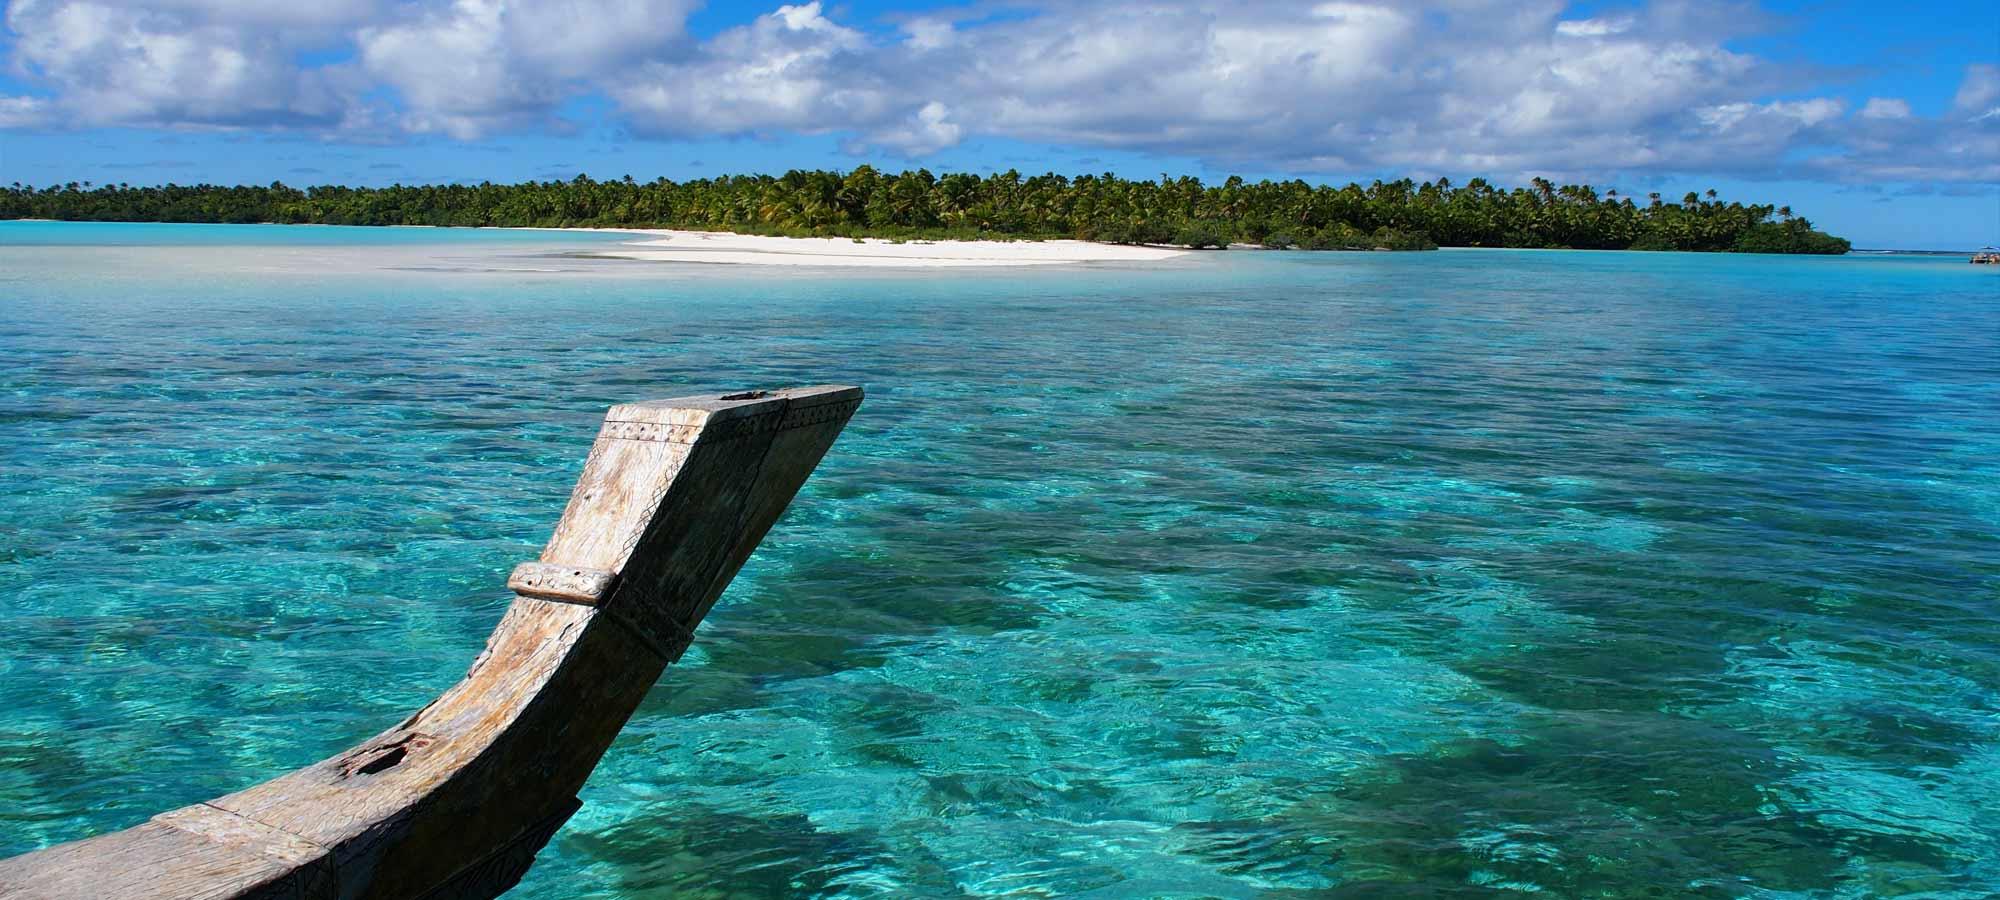 Inselhopping im Pazifik